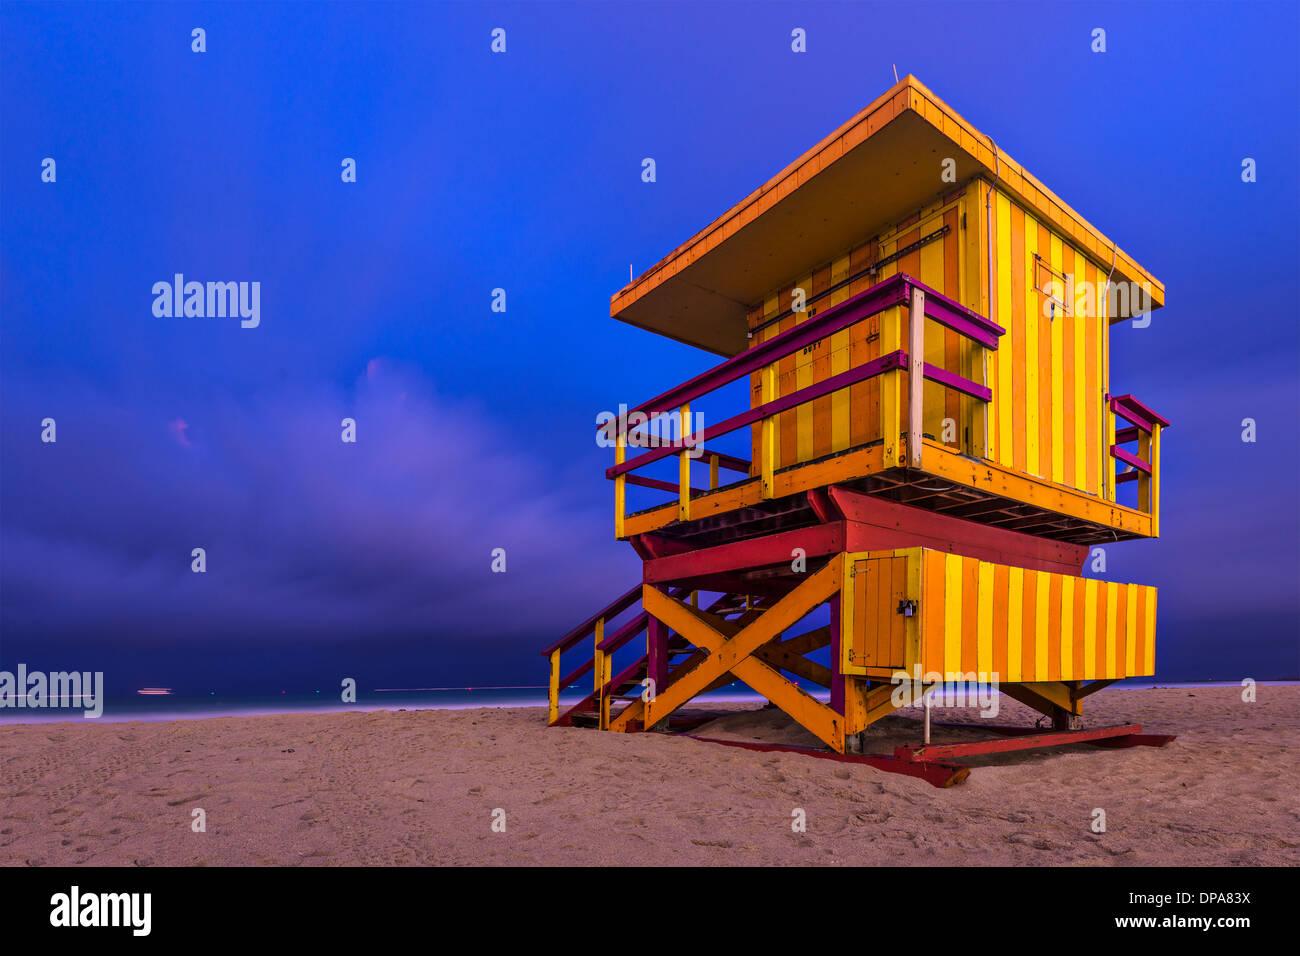 South Beach, Miami, Floride, USA lifeguard poster au crépuscule. Photo Stock